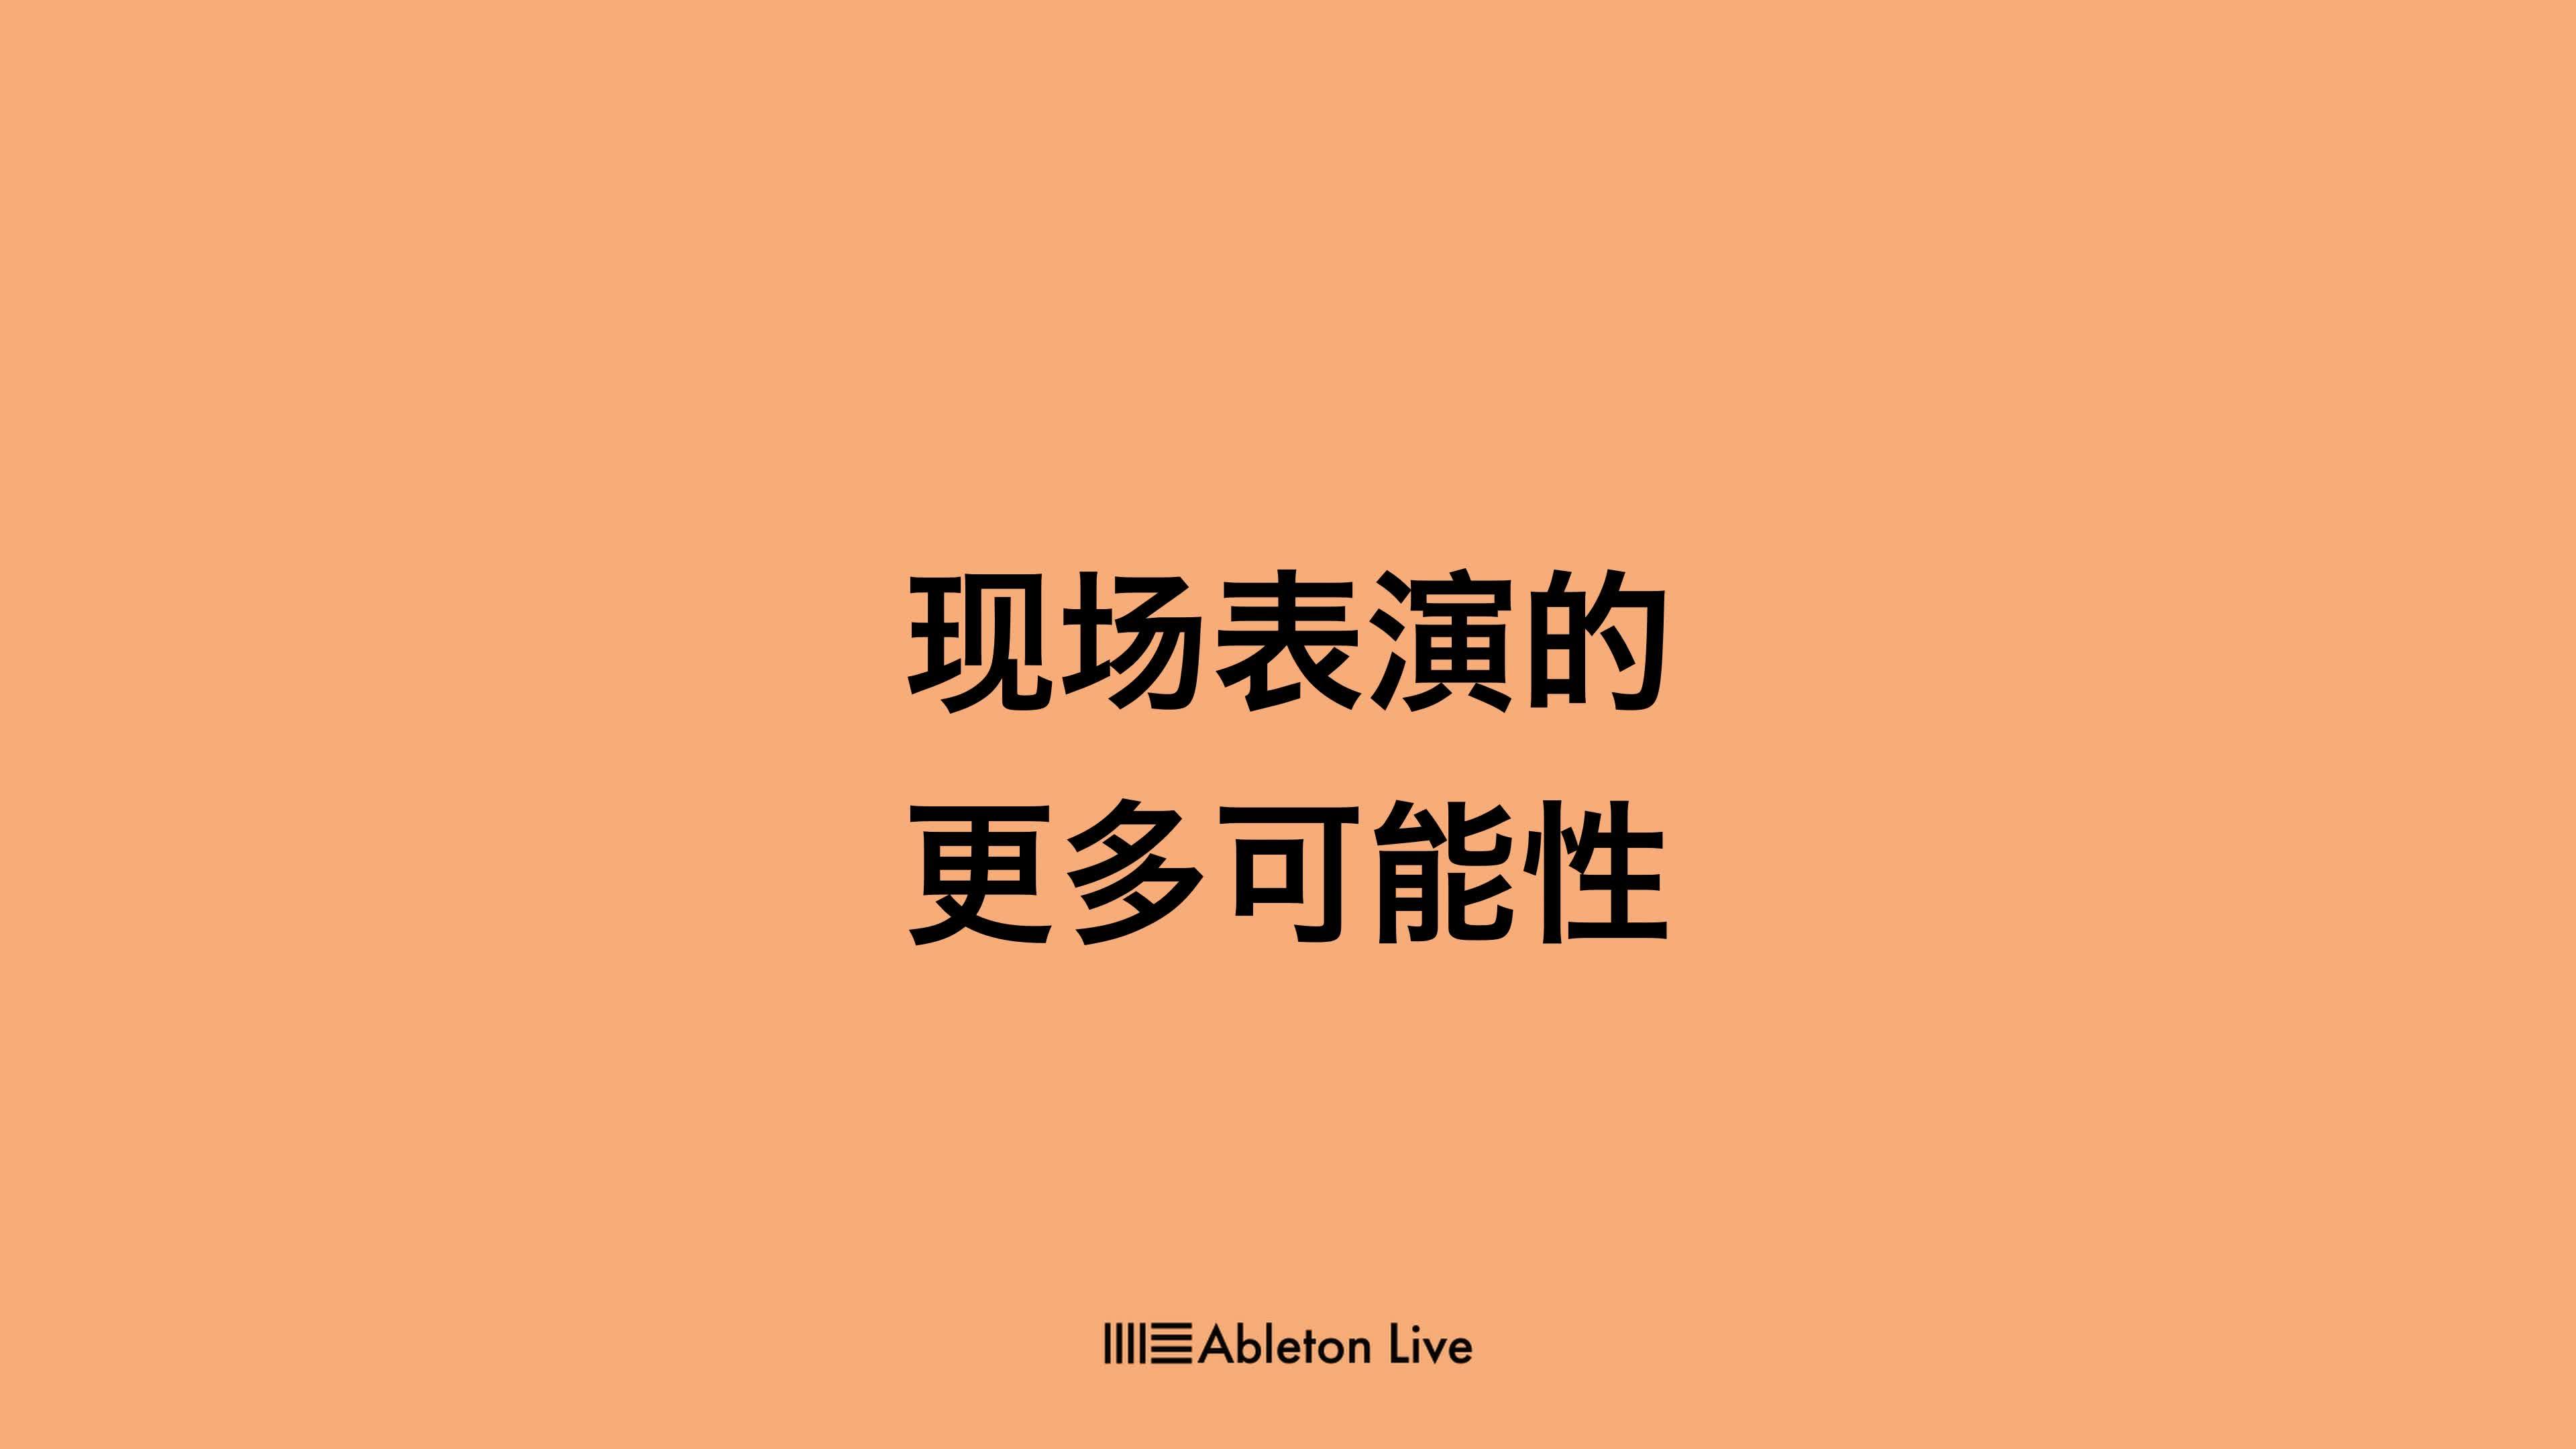 Ableton  Live11-現場表演的更多可能性